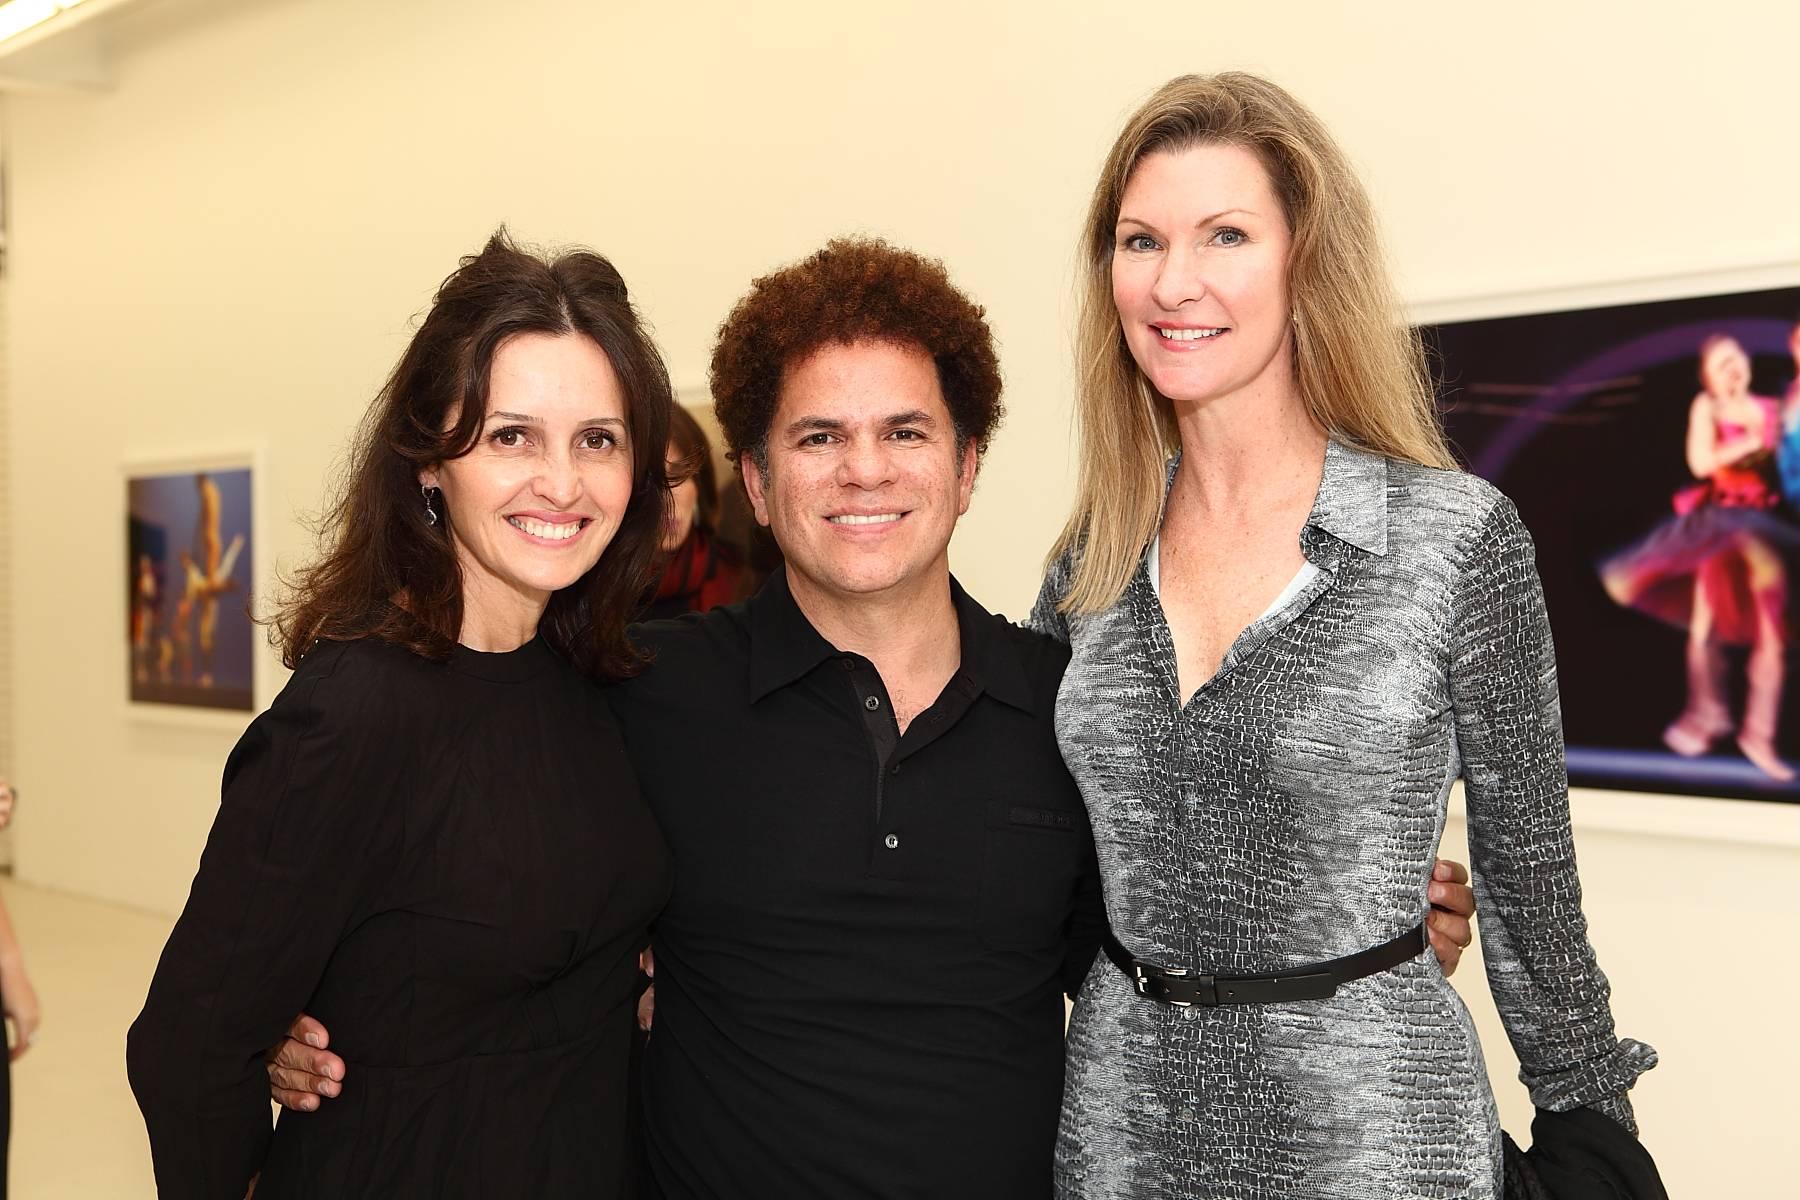 Alina Shriver, Romero Britto & Elizabeth Beracasa